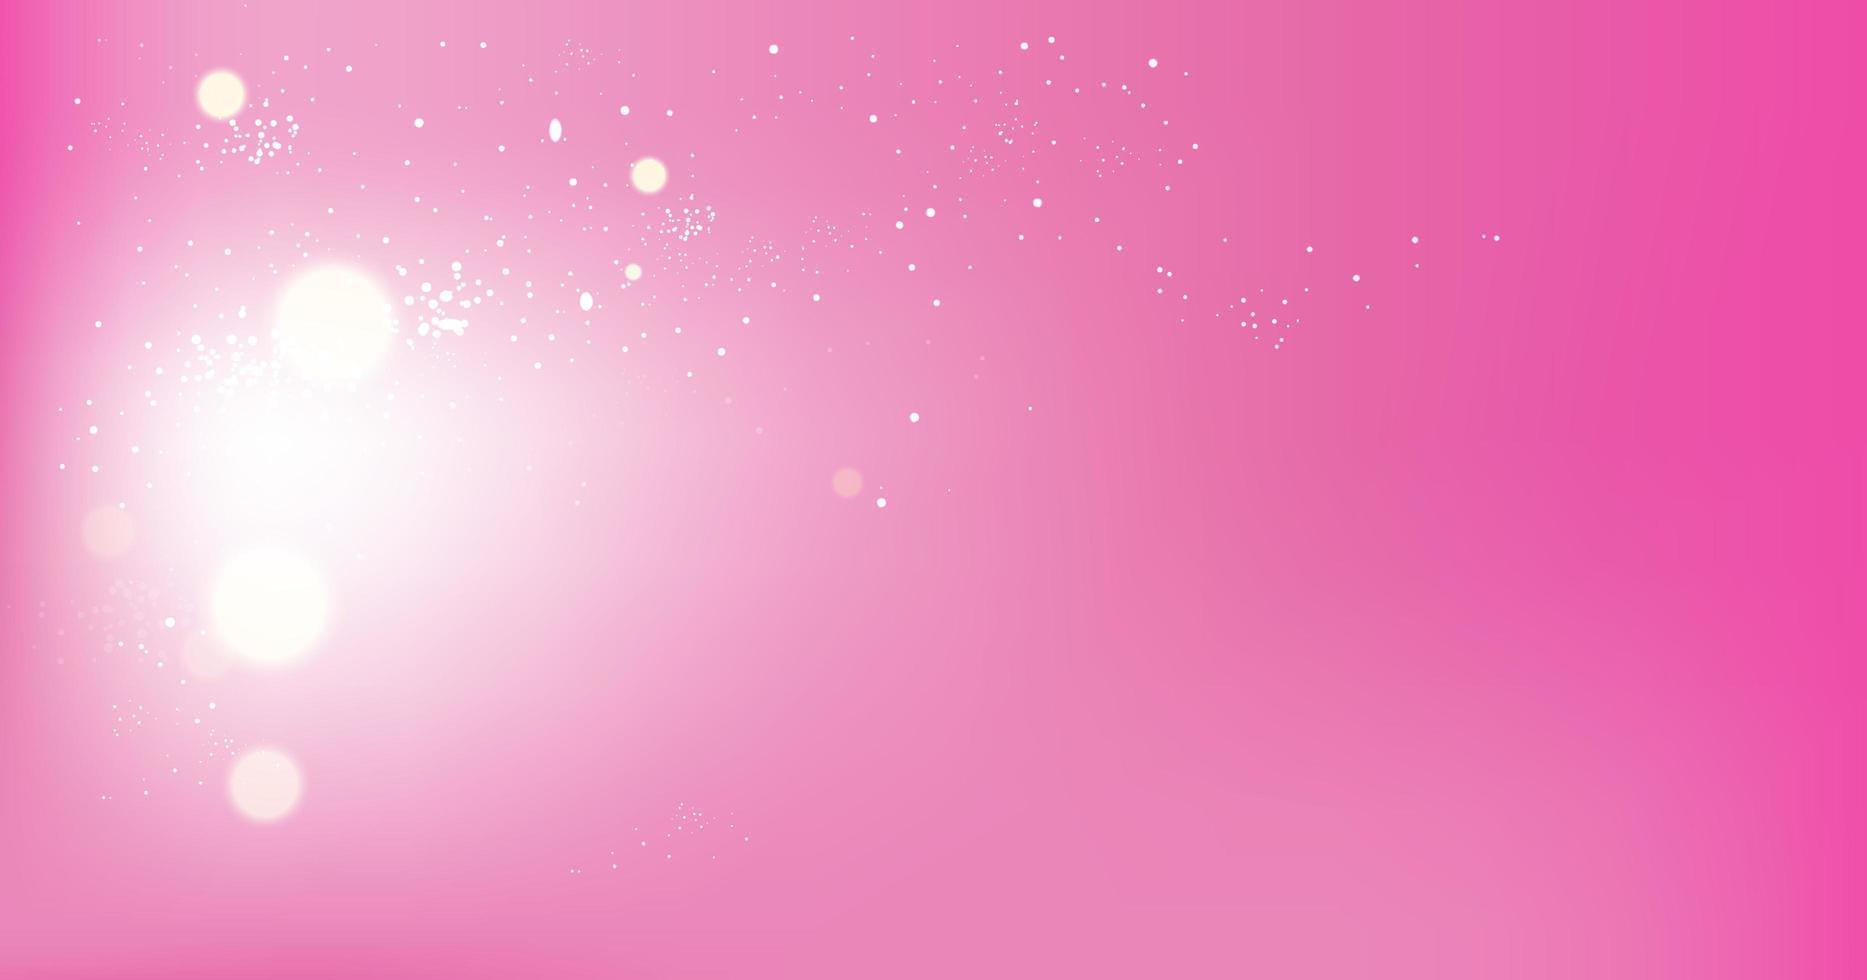 Pink Glowing Bokeh Background vector